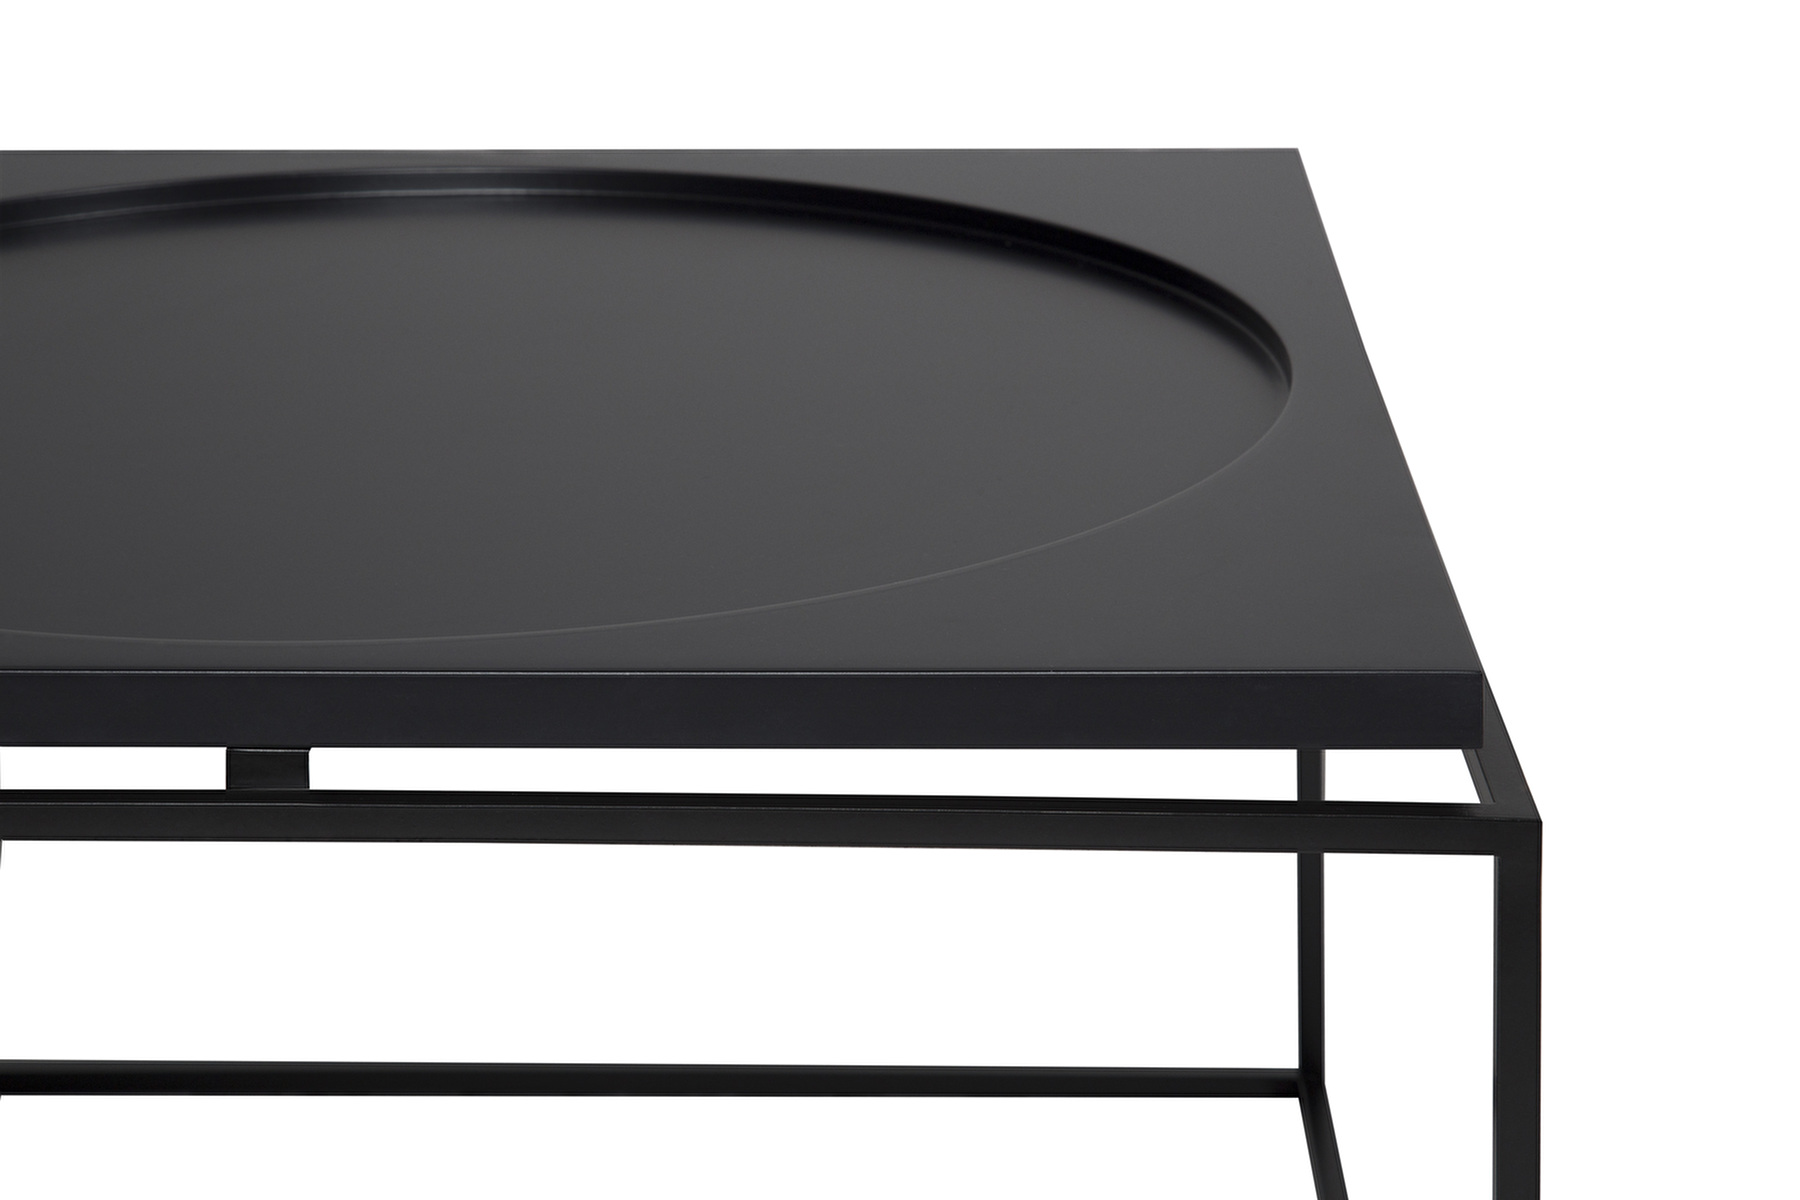 Coffee table Circle in Square ELENSEN Home Design